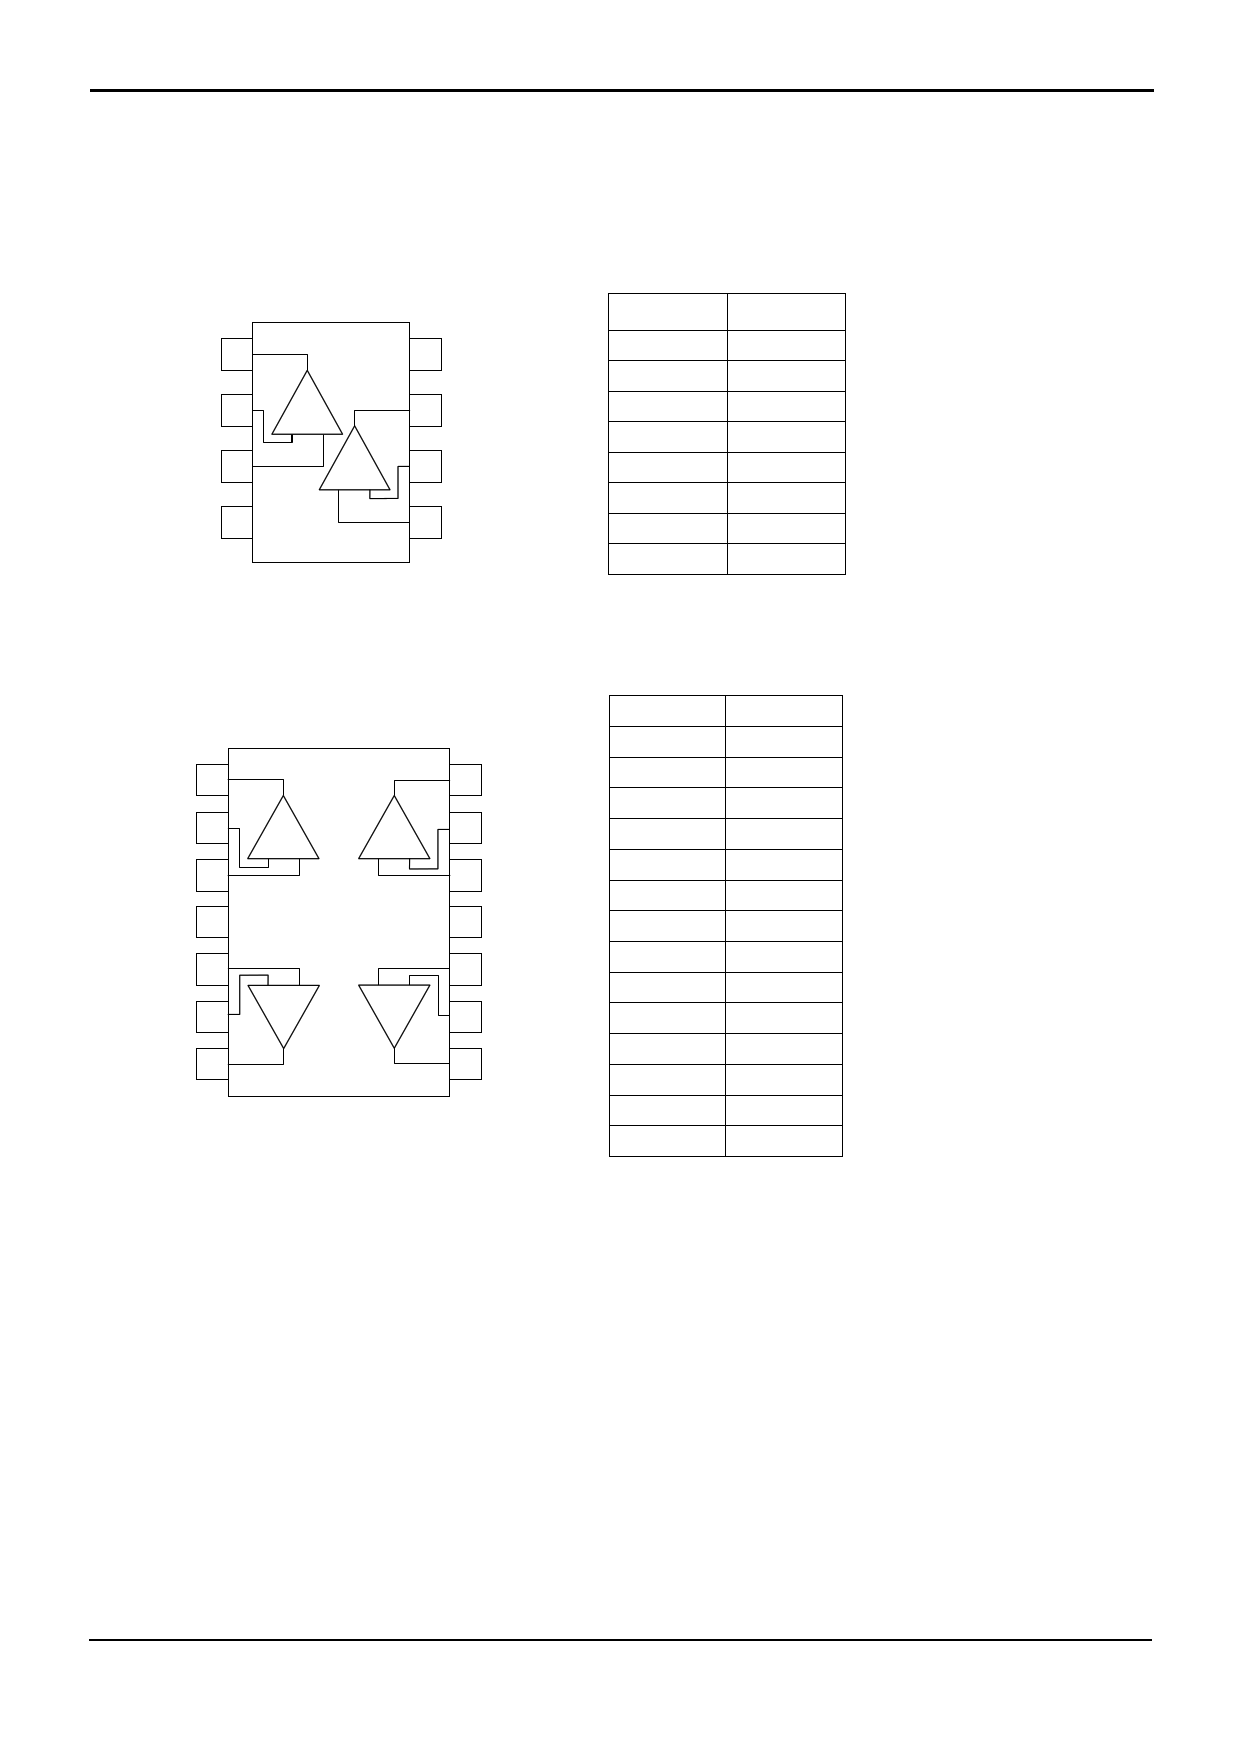 TLR342F pdf, equivalent, schematic